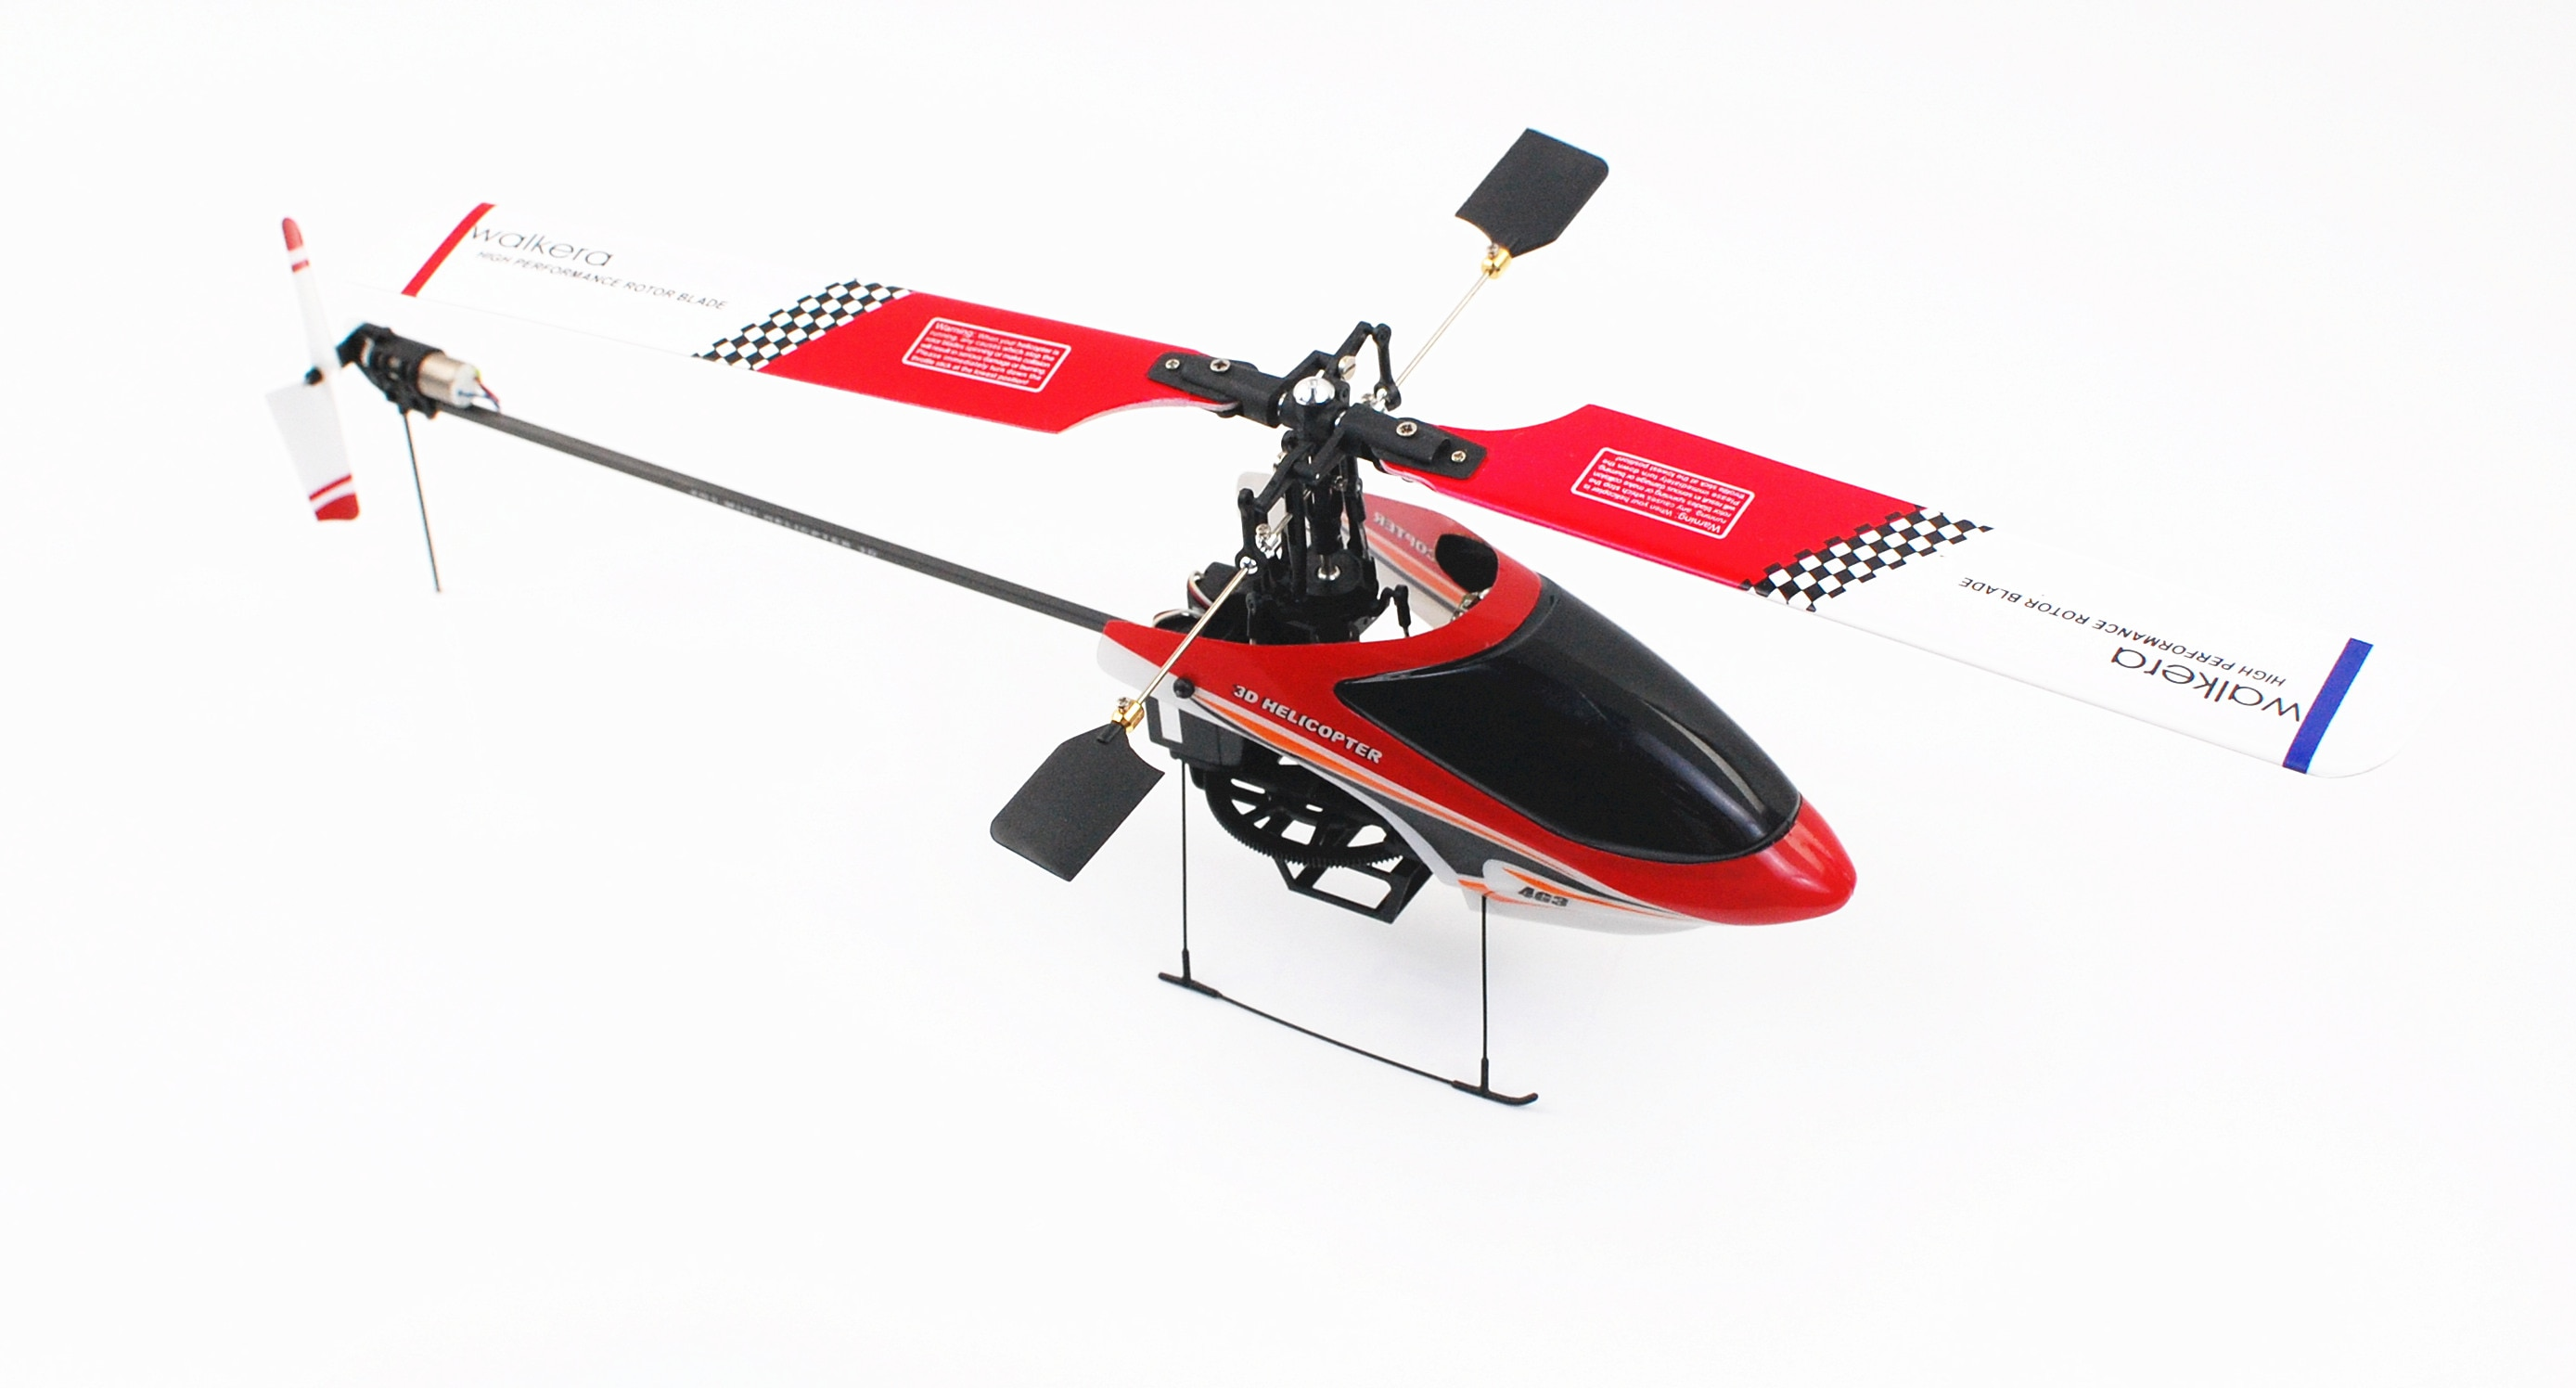 Walkera 4G3 6CH 2.4G 3D Helicopter /upgraded Brushless ESC+ Motor (WK-2601)